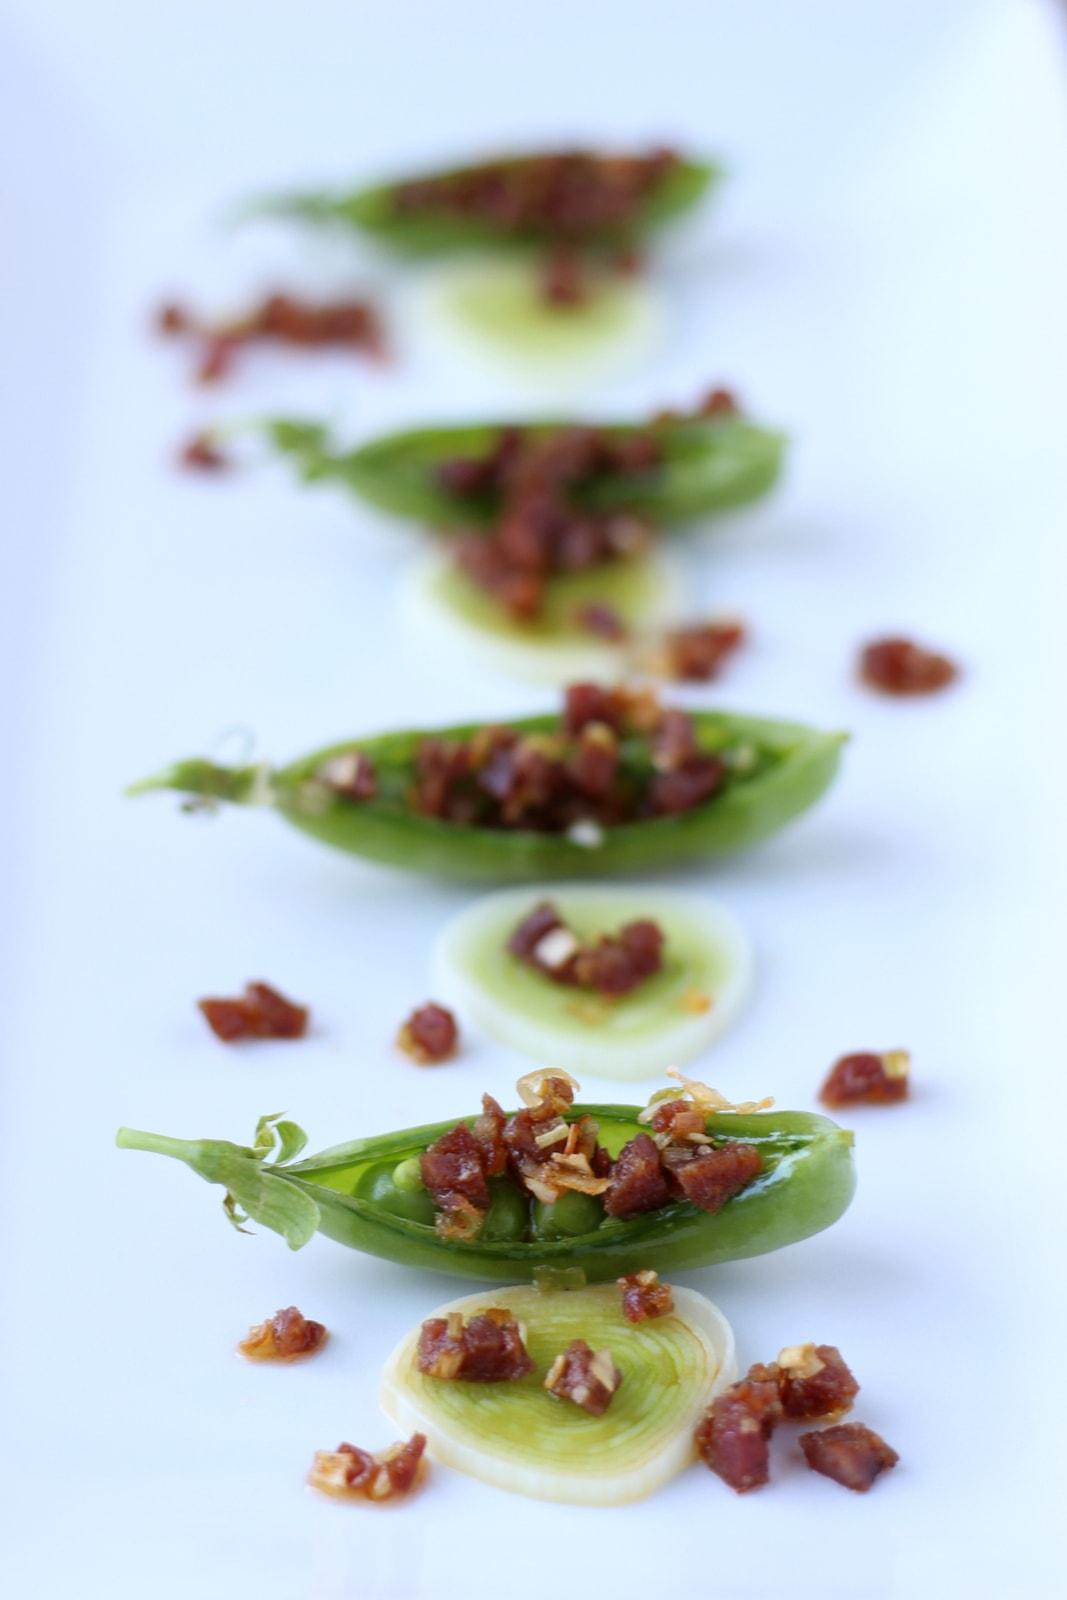 Chorizo and Leek Stuffed Pea Pods - thewoodenskillet.com #appetizer #spanishchorizo